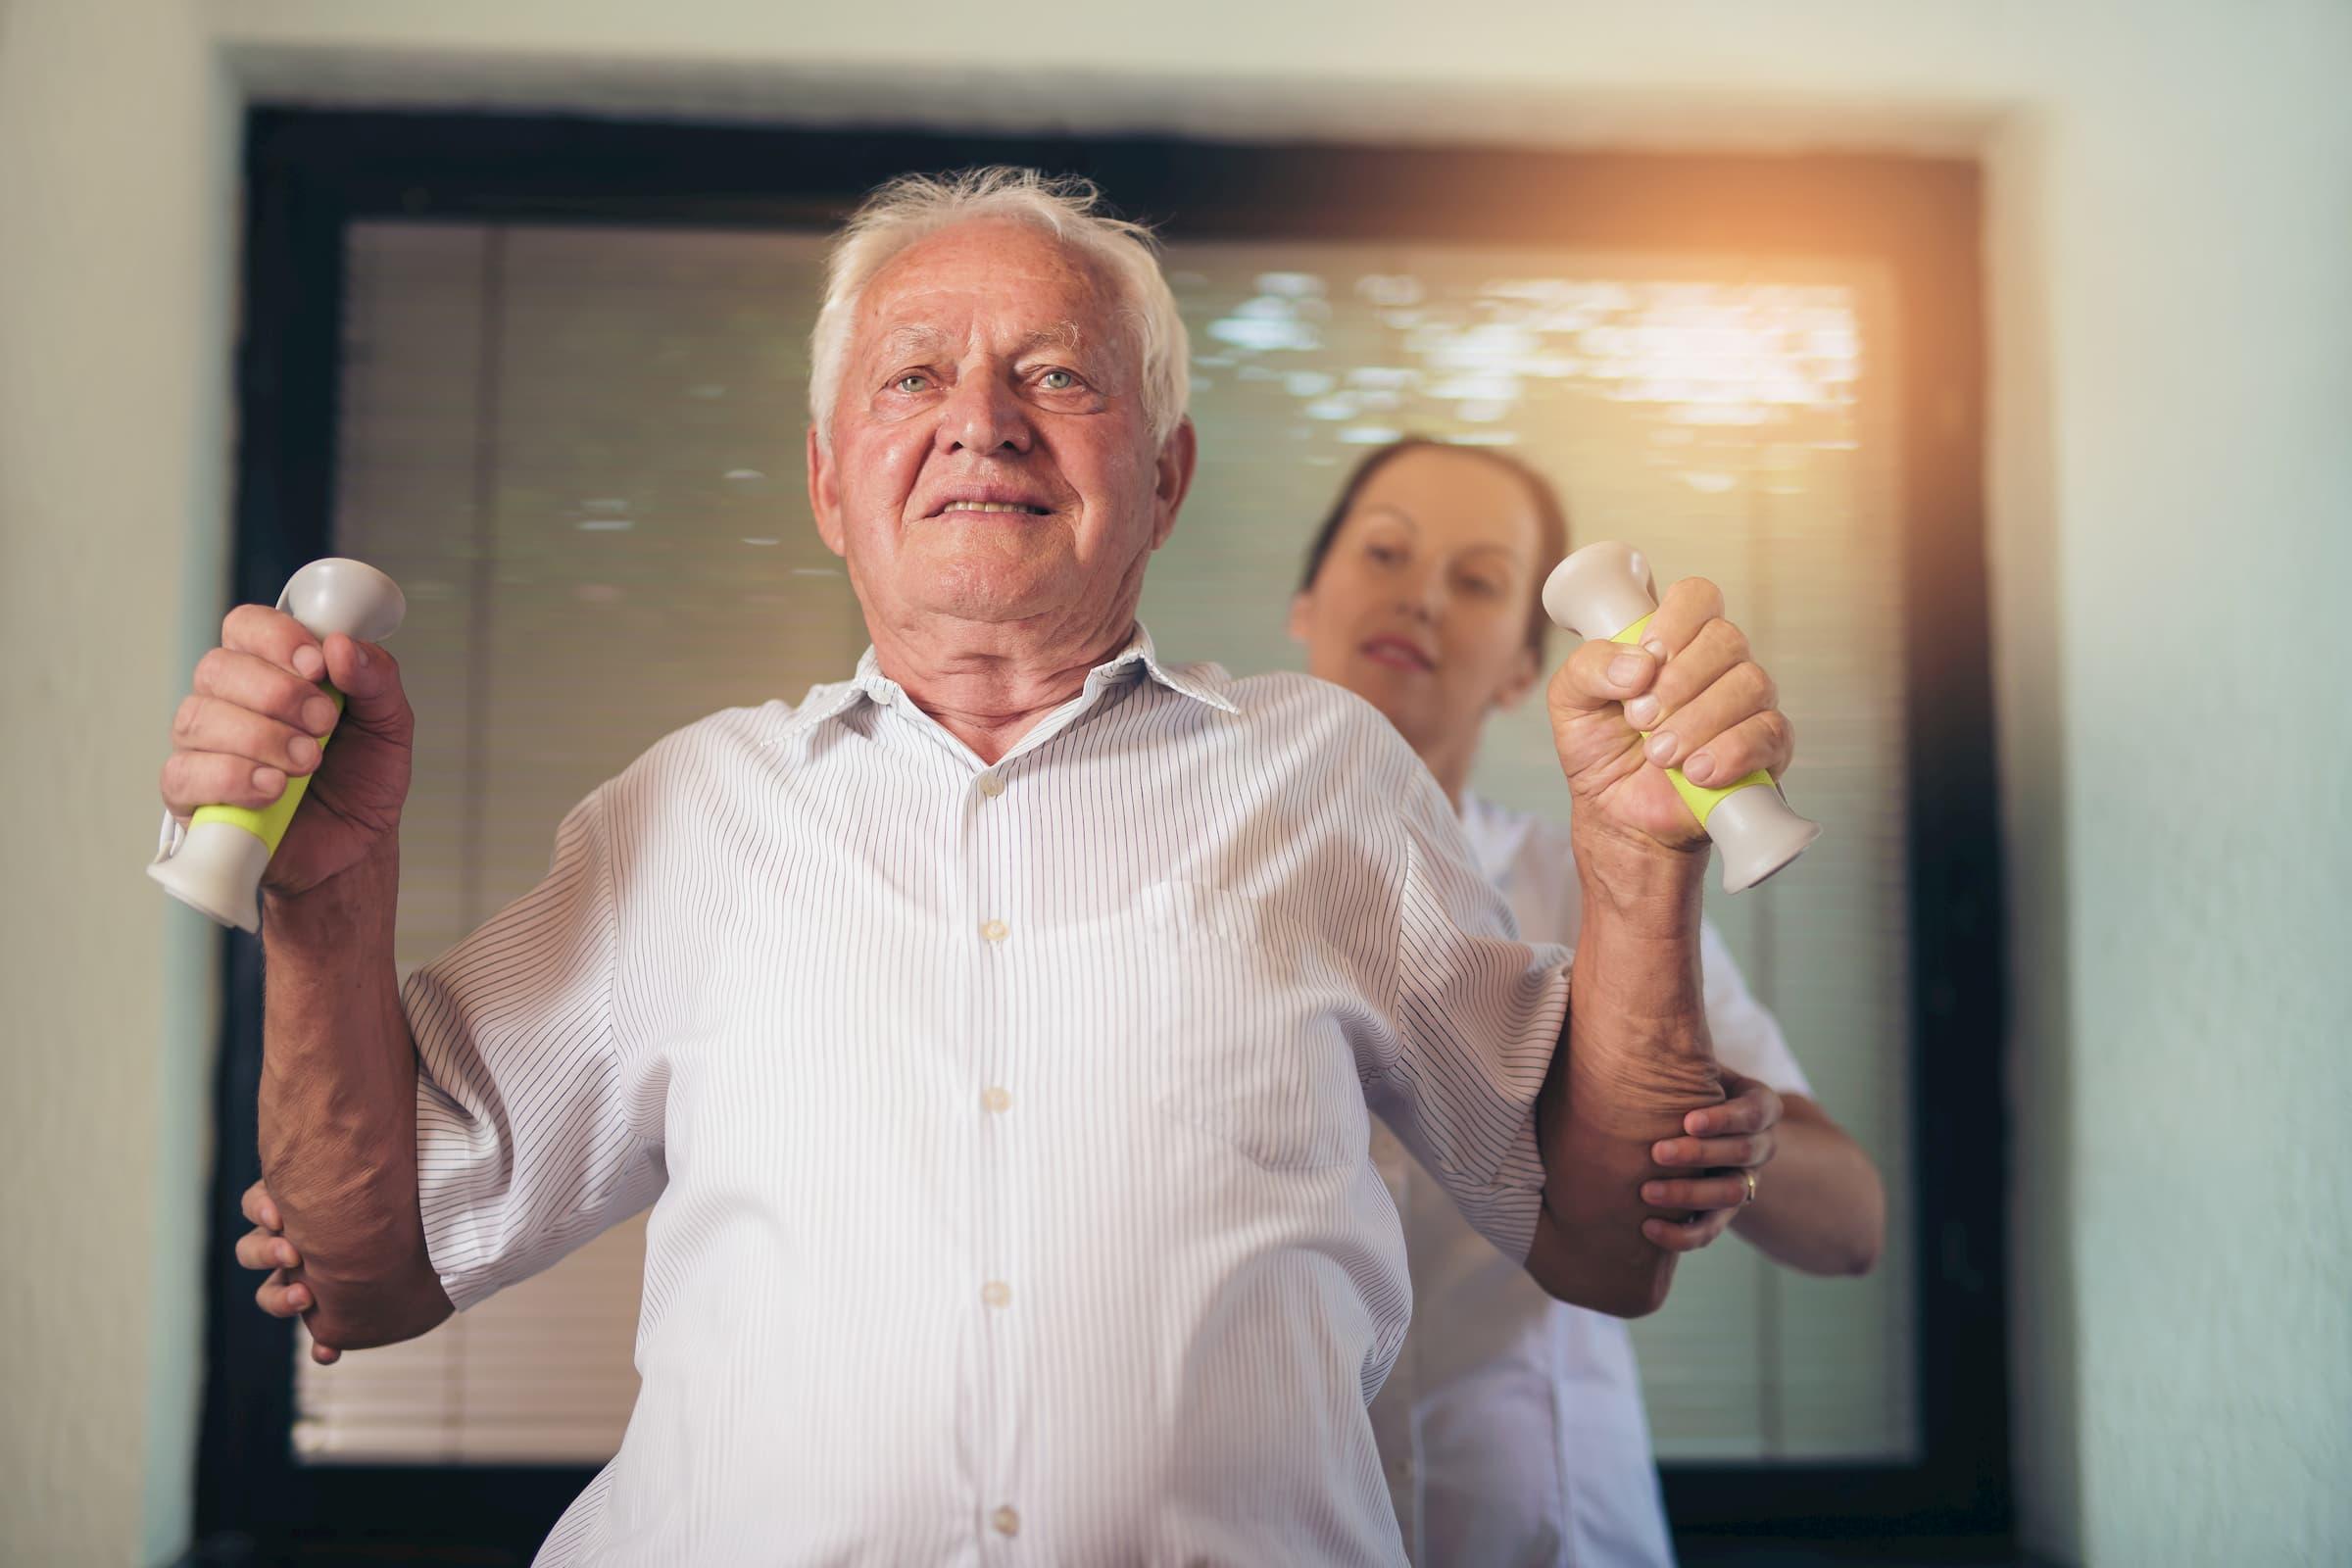 elderly white man lifting weights with nurse therapist